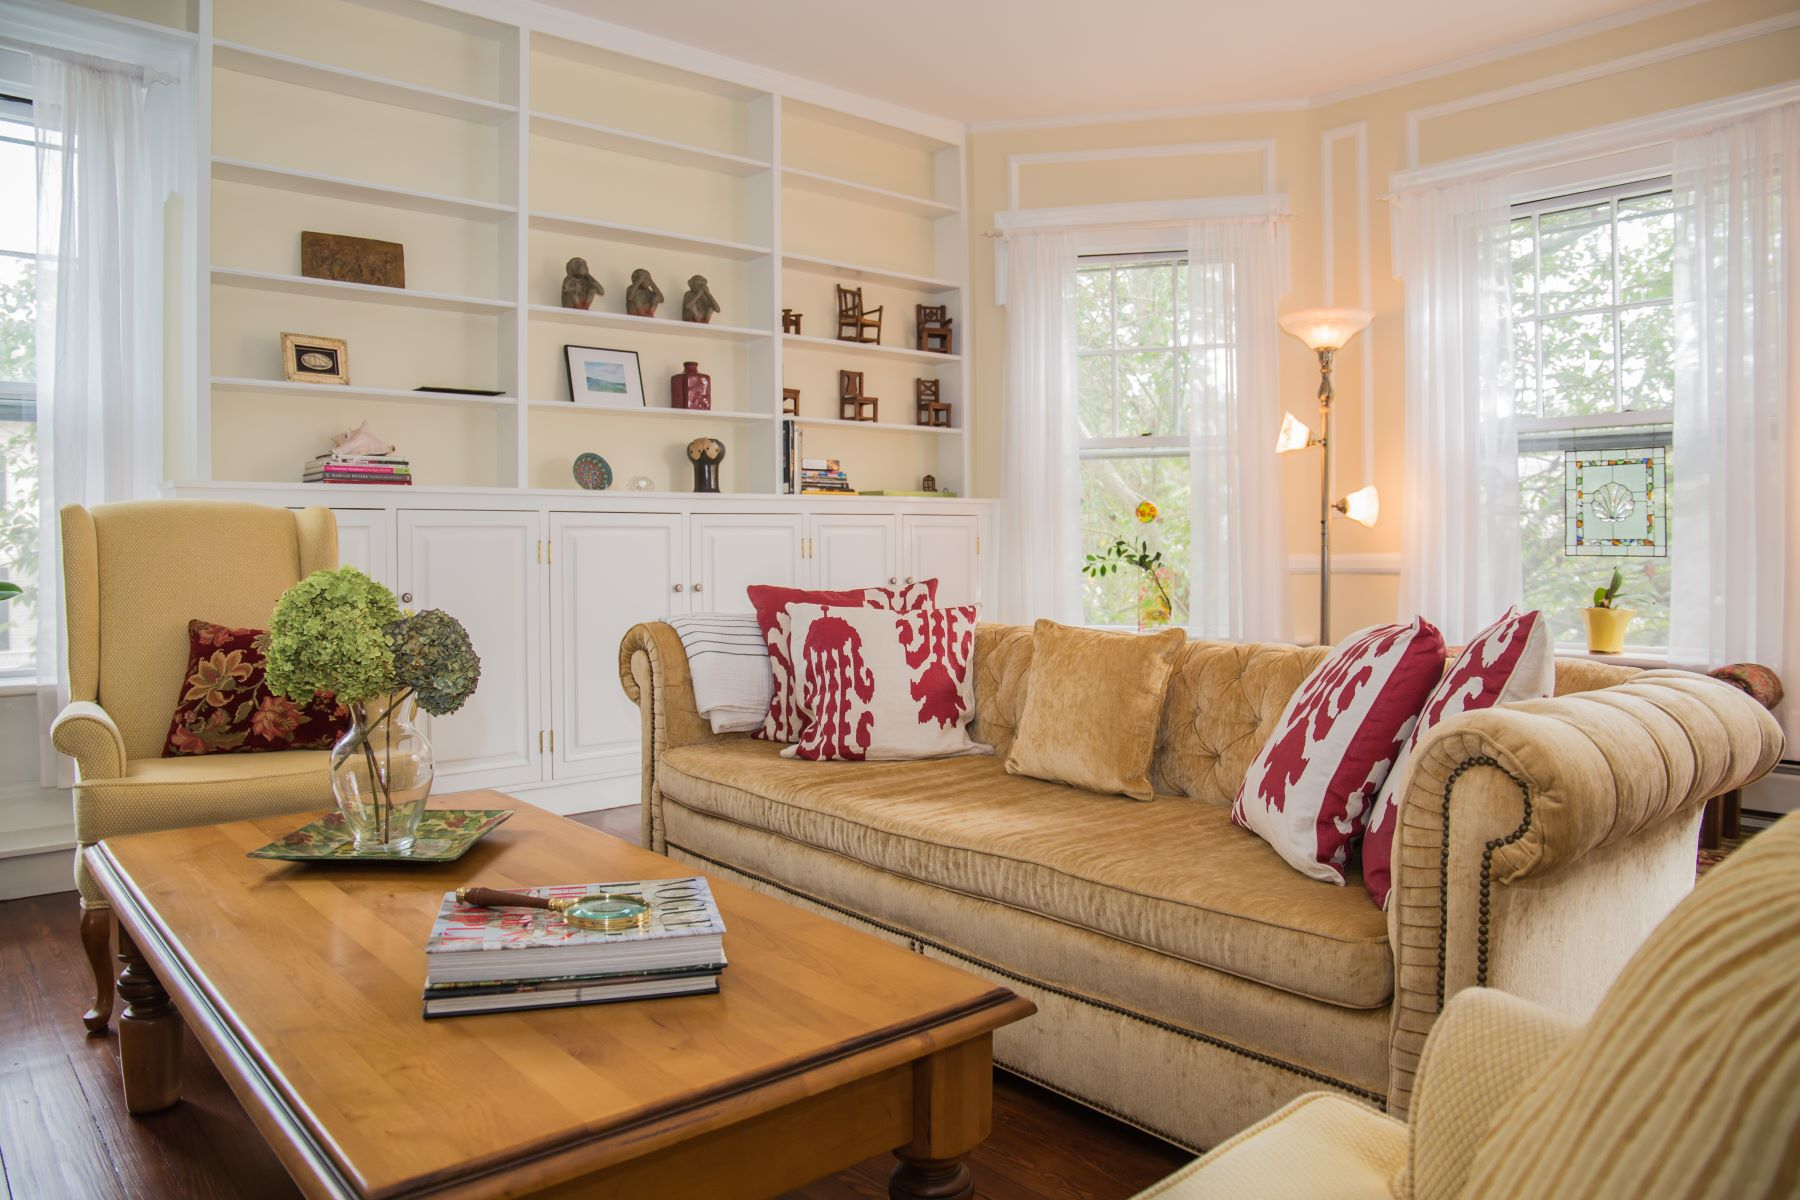 Additional photo for property listing at The John Irish House 28 Kay Street, Unit #5 Newport, Rhode Island 02840 United States